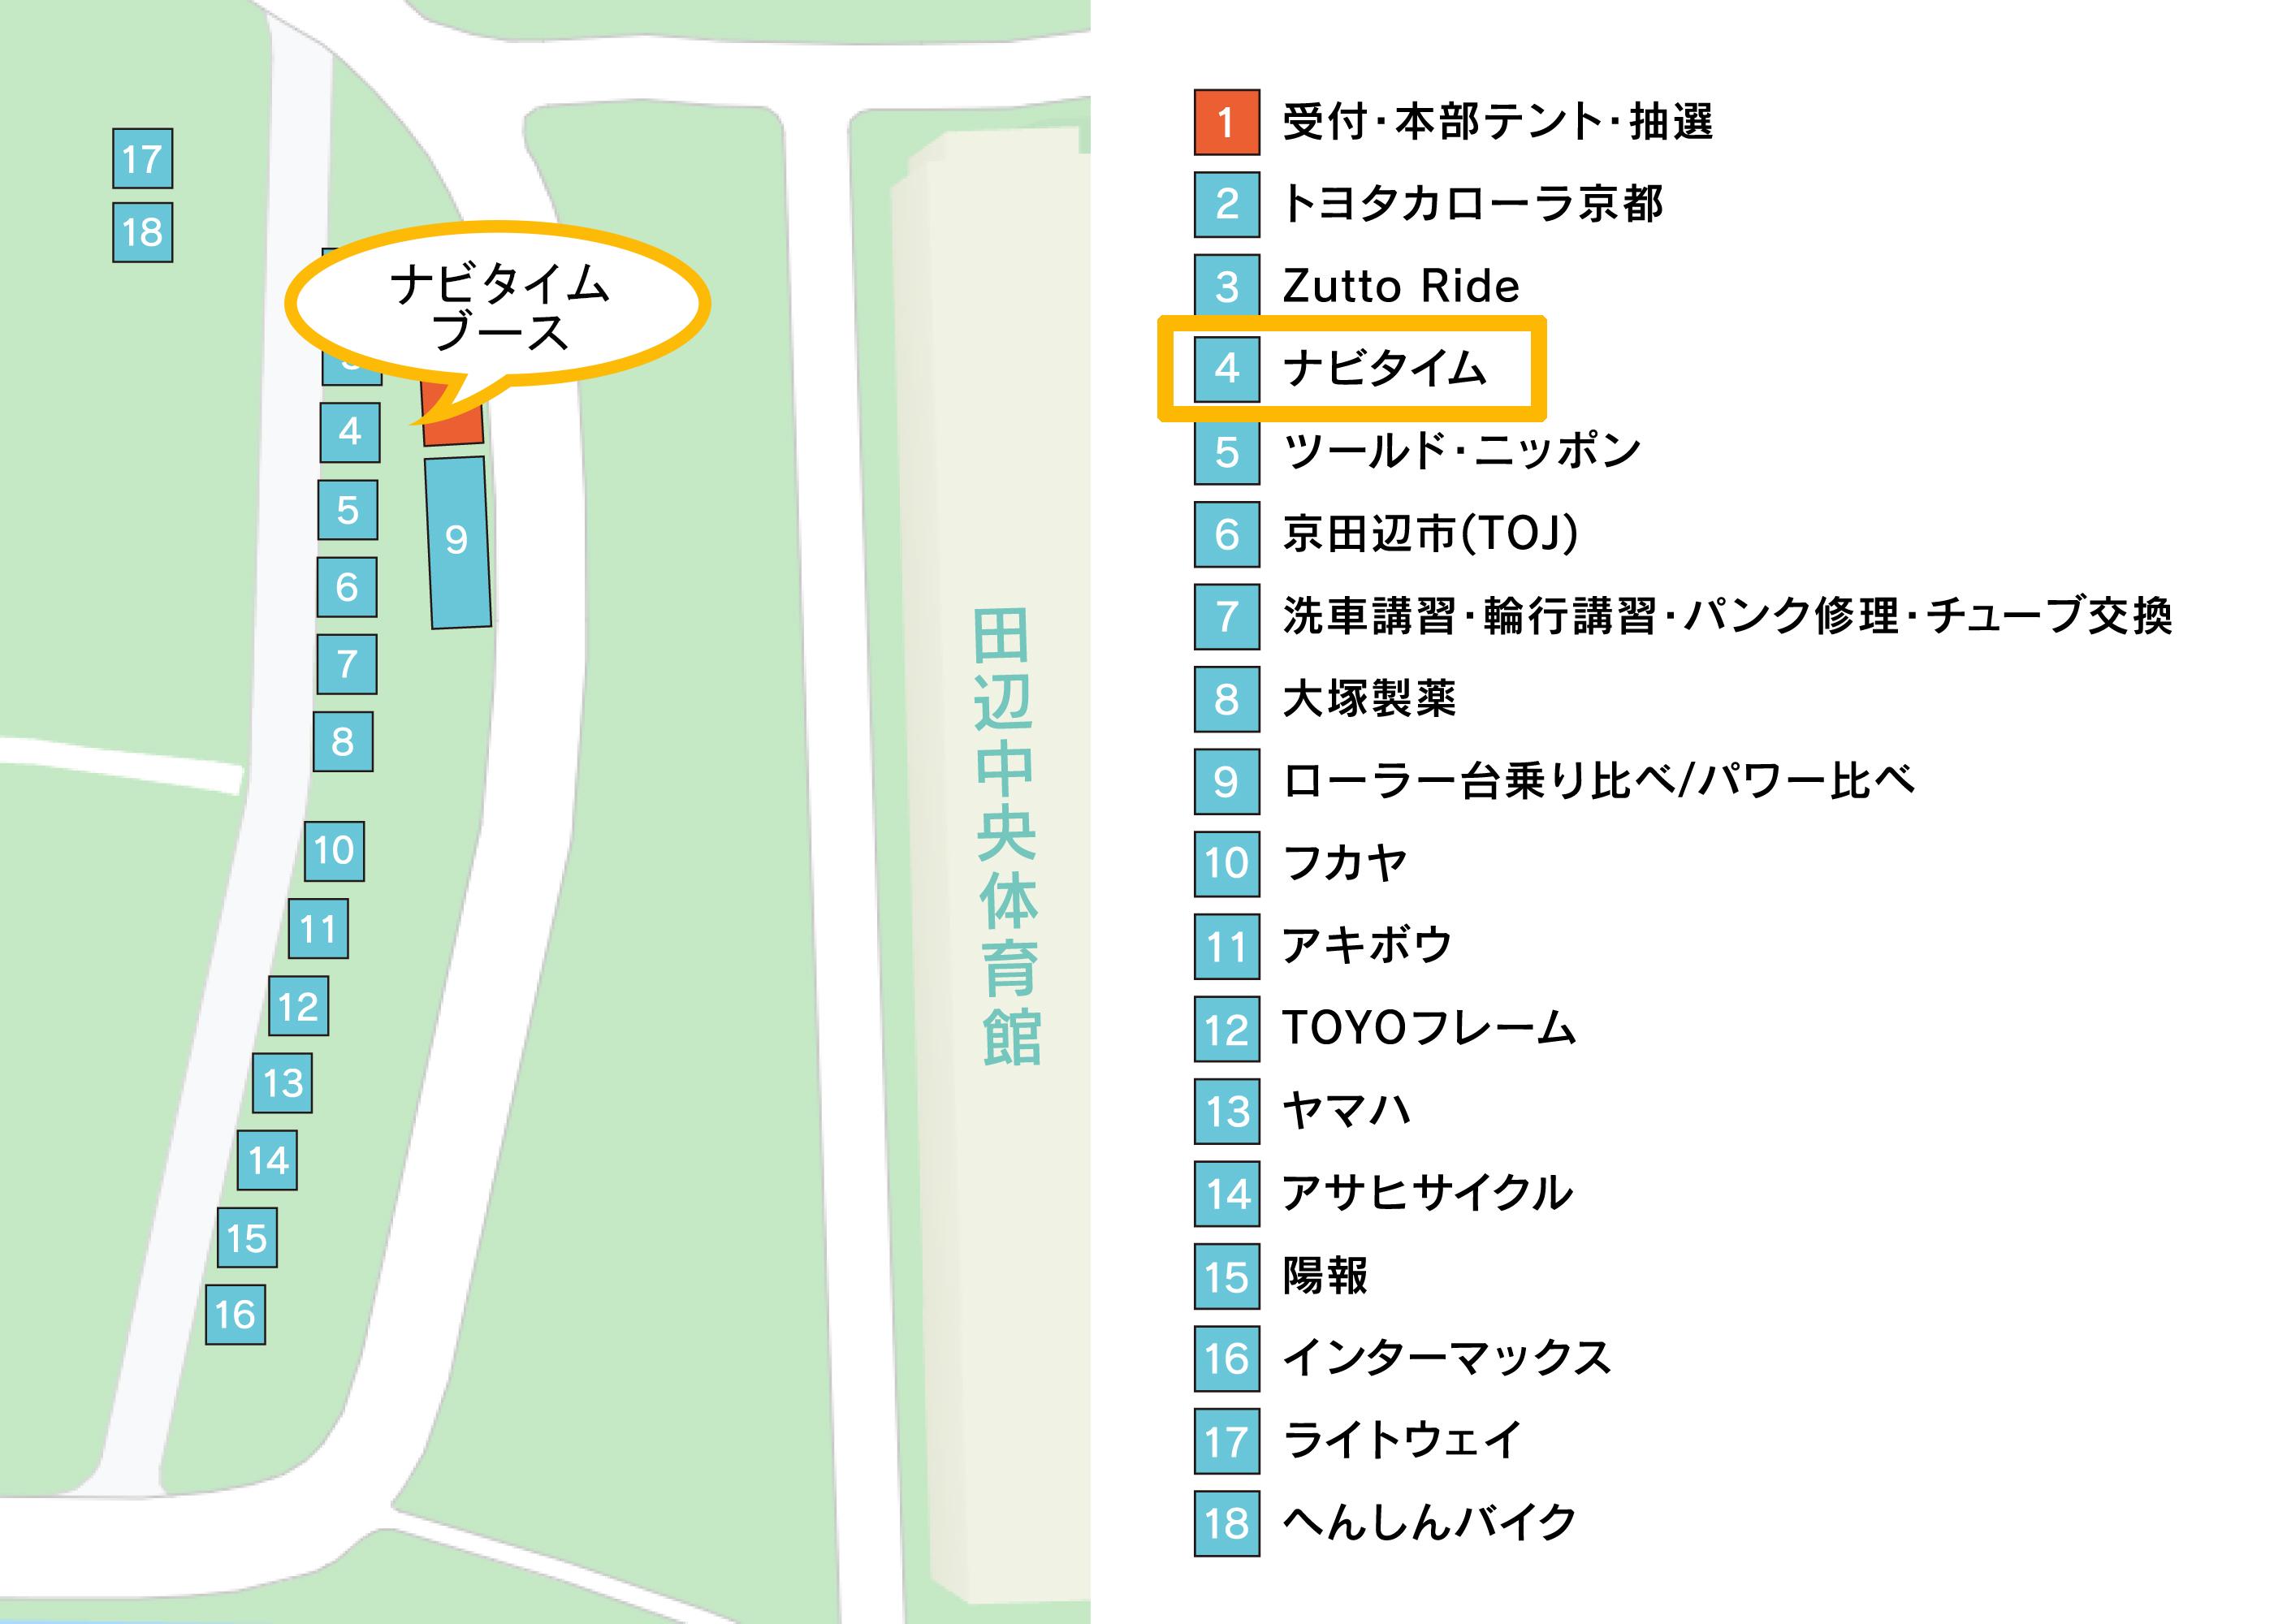 http://corporate.navitime.co.jp/topics/5ac14d80b6627454b081a2eb98282602d338c364.png